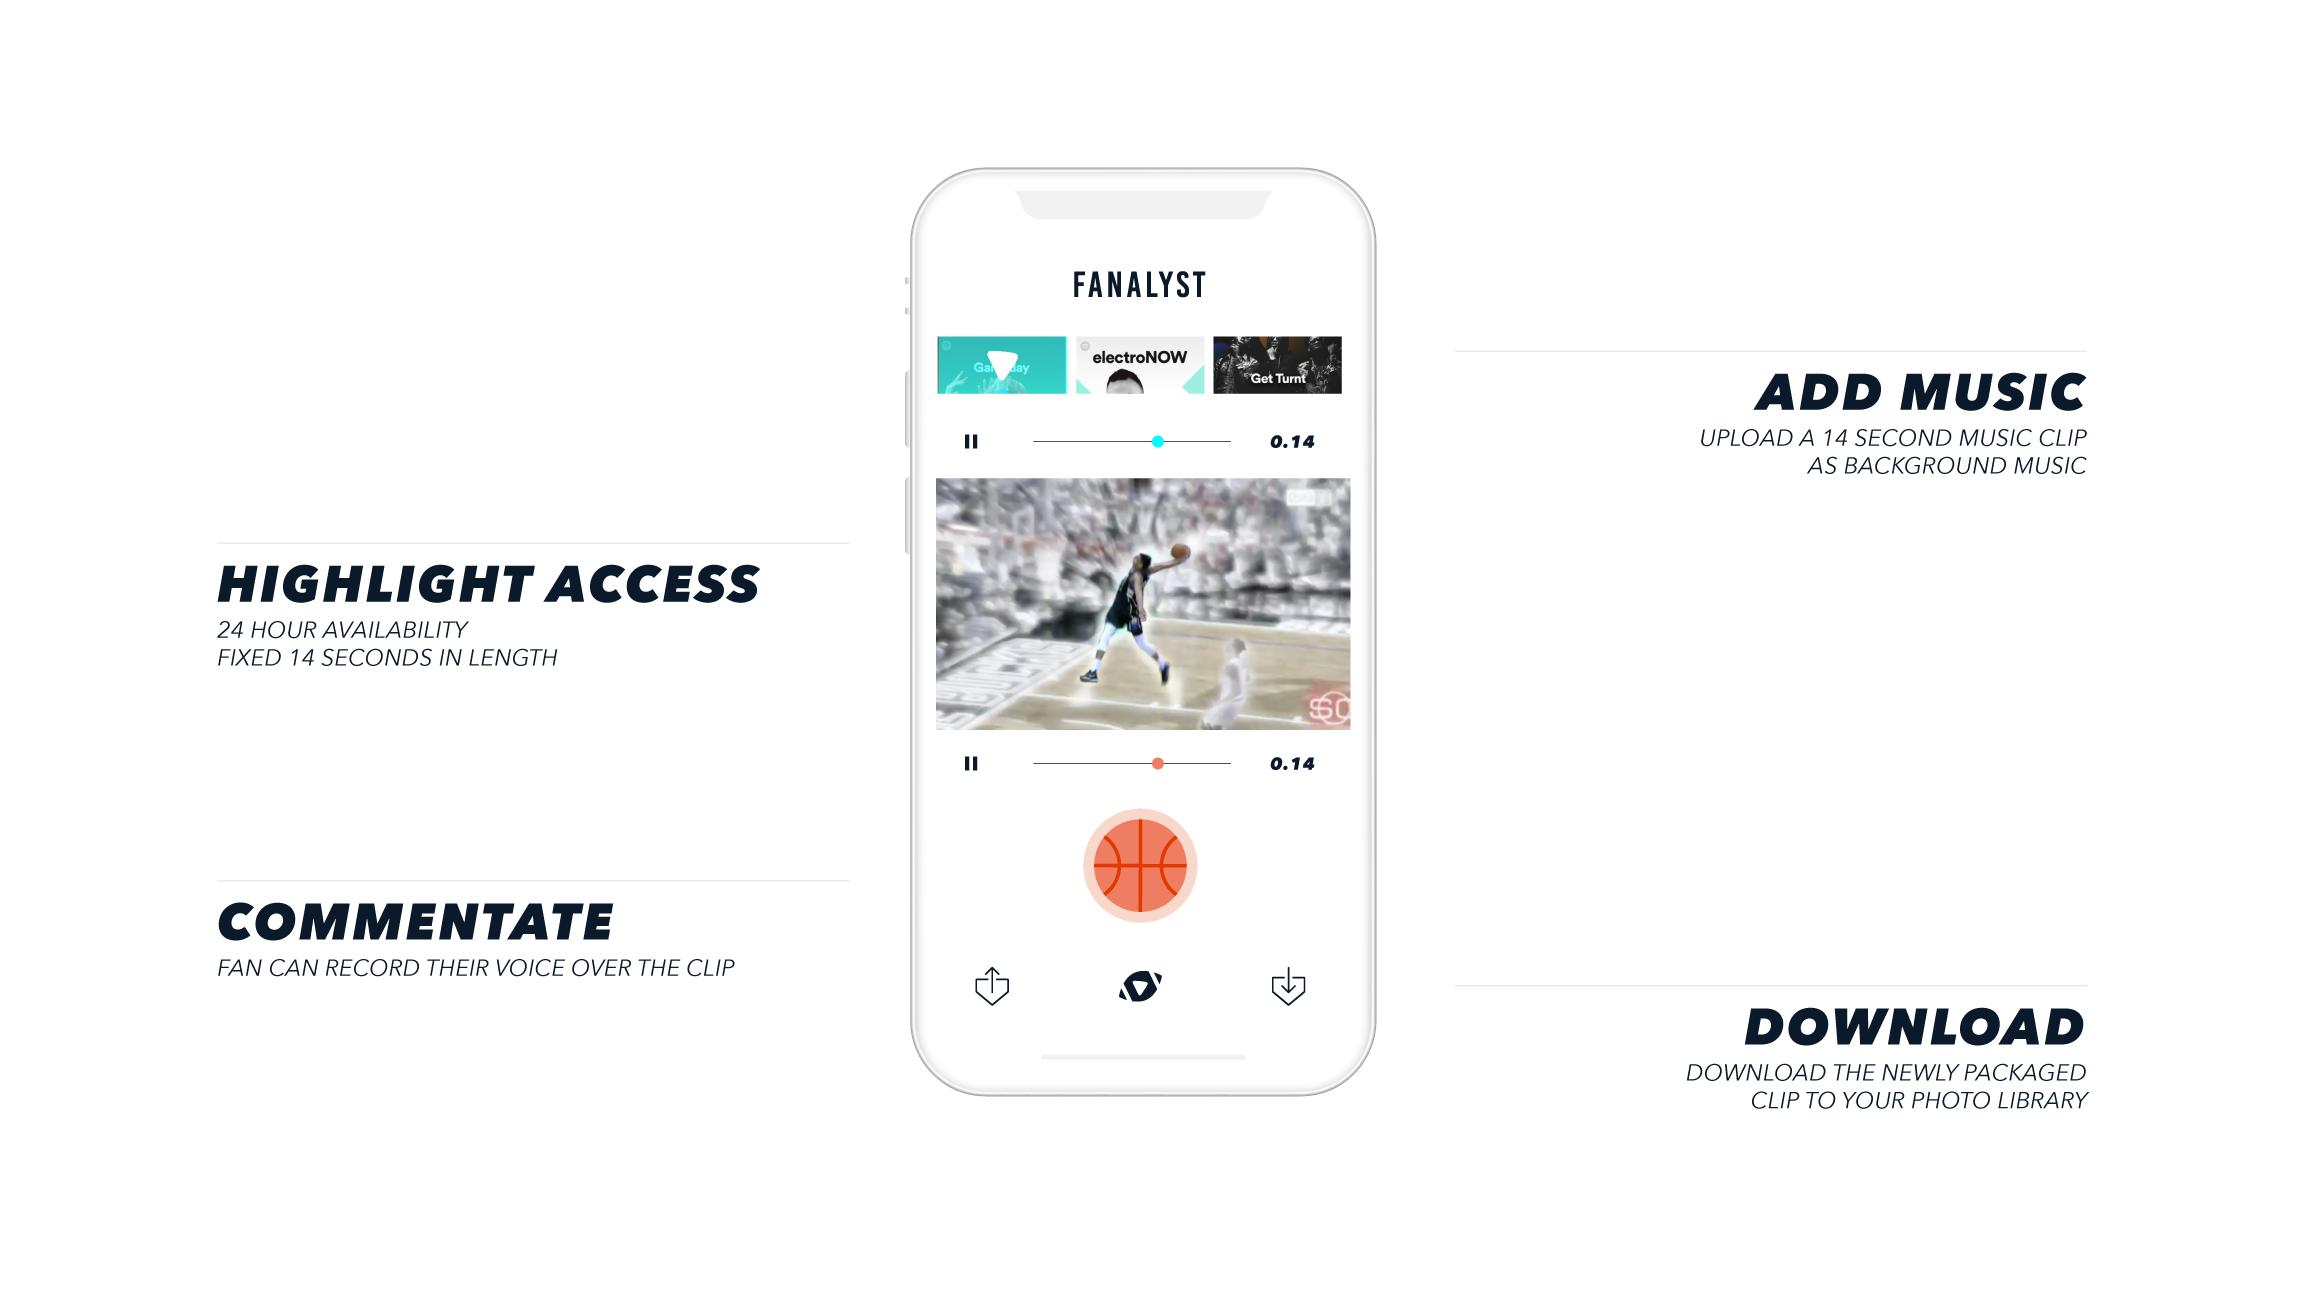 Fanalyst - A Sports Highlight Generator for Instagram